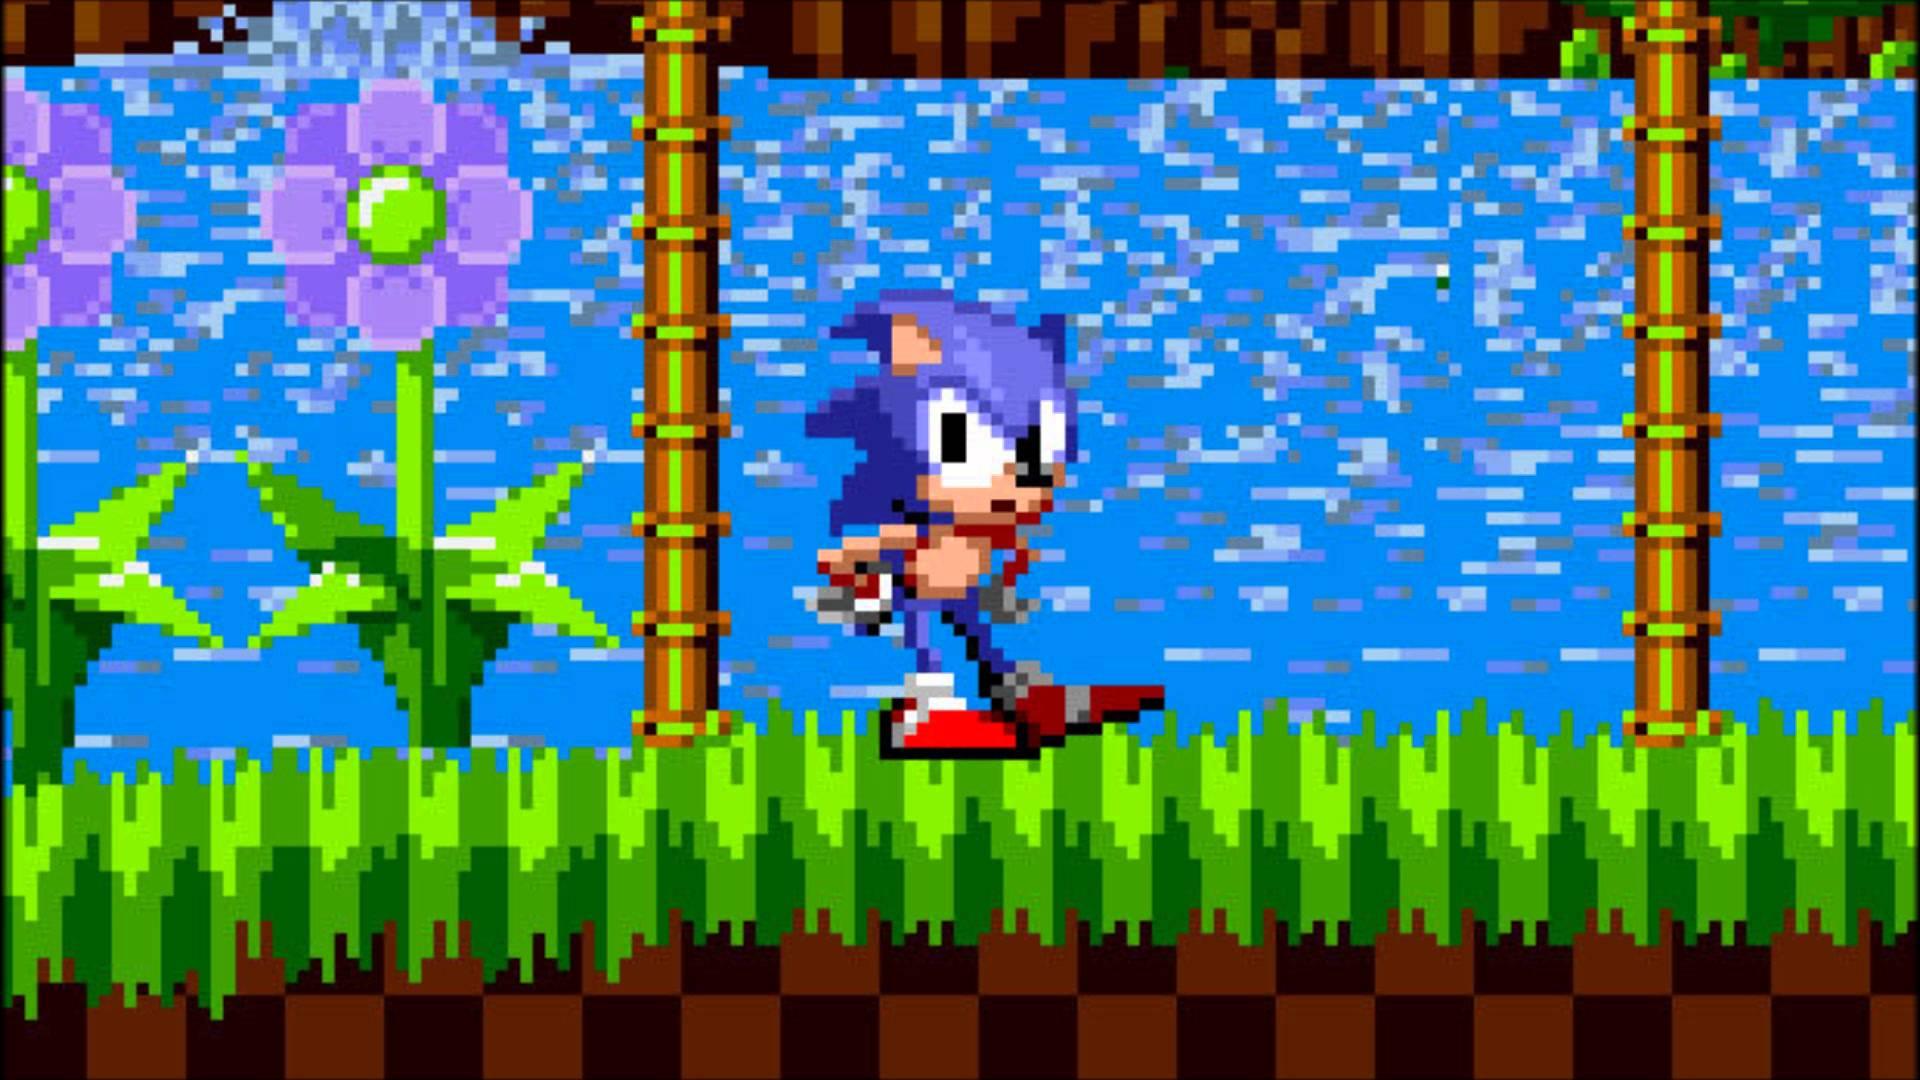 Mobile game apologizes for Sonic's 'Boob' typo